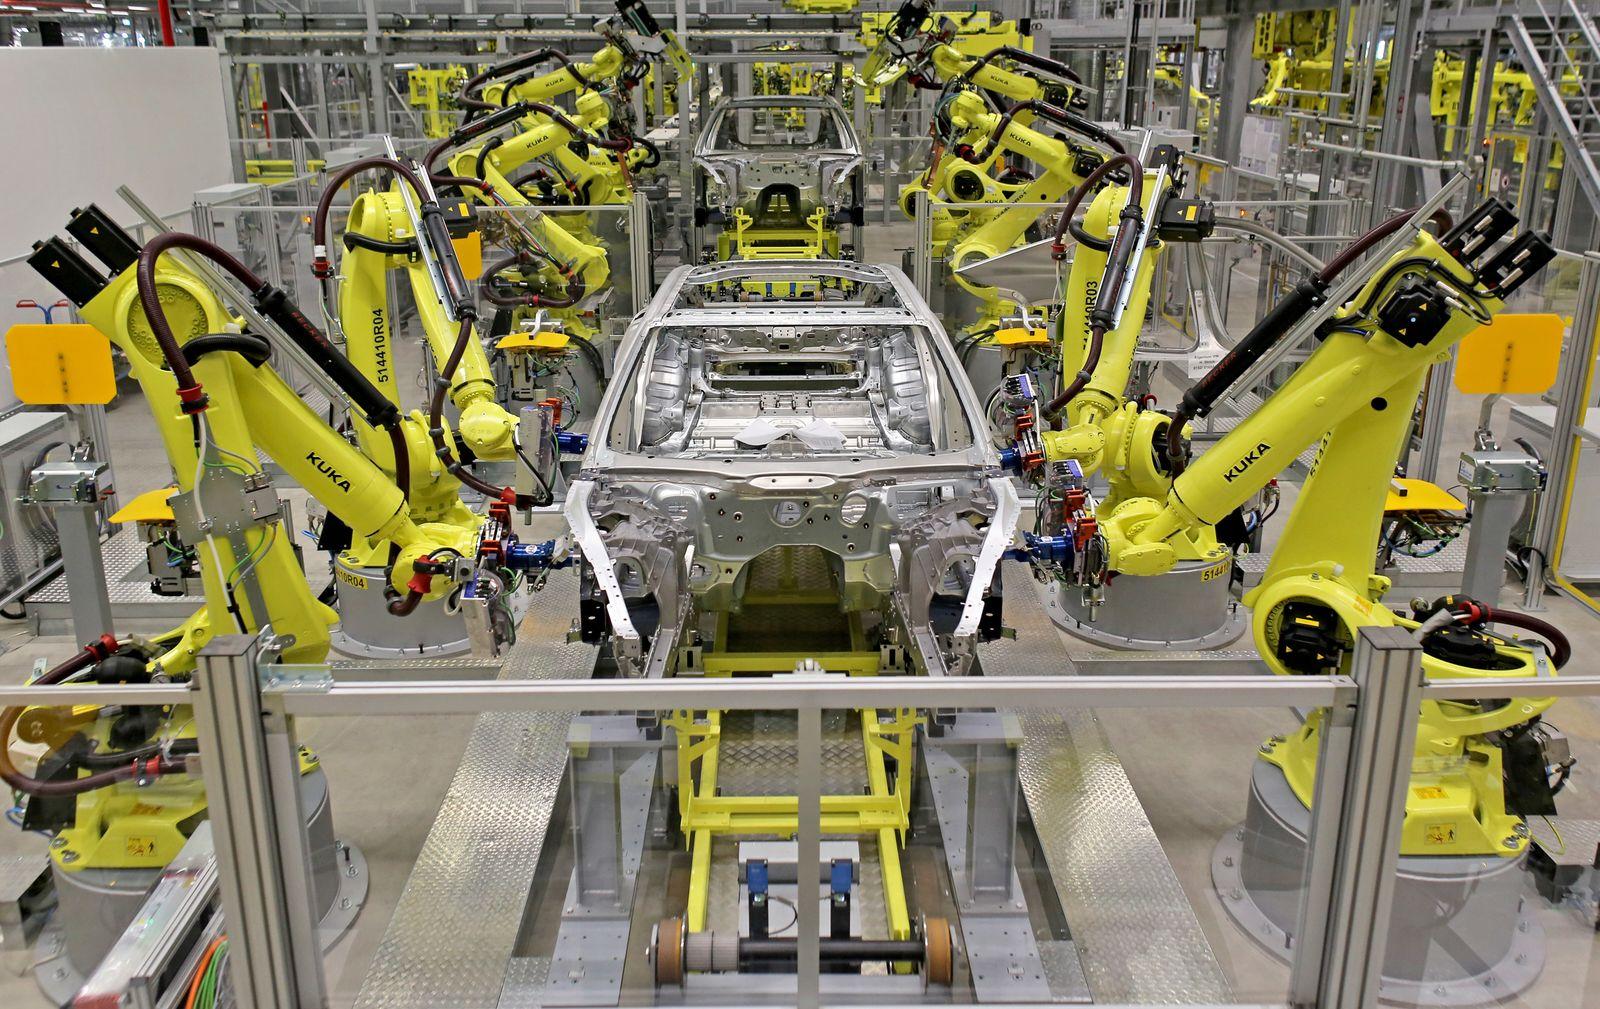 Automatisierung / Roboter / Fabrik